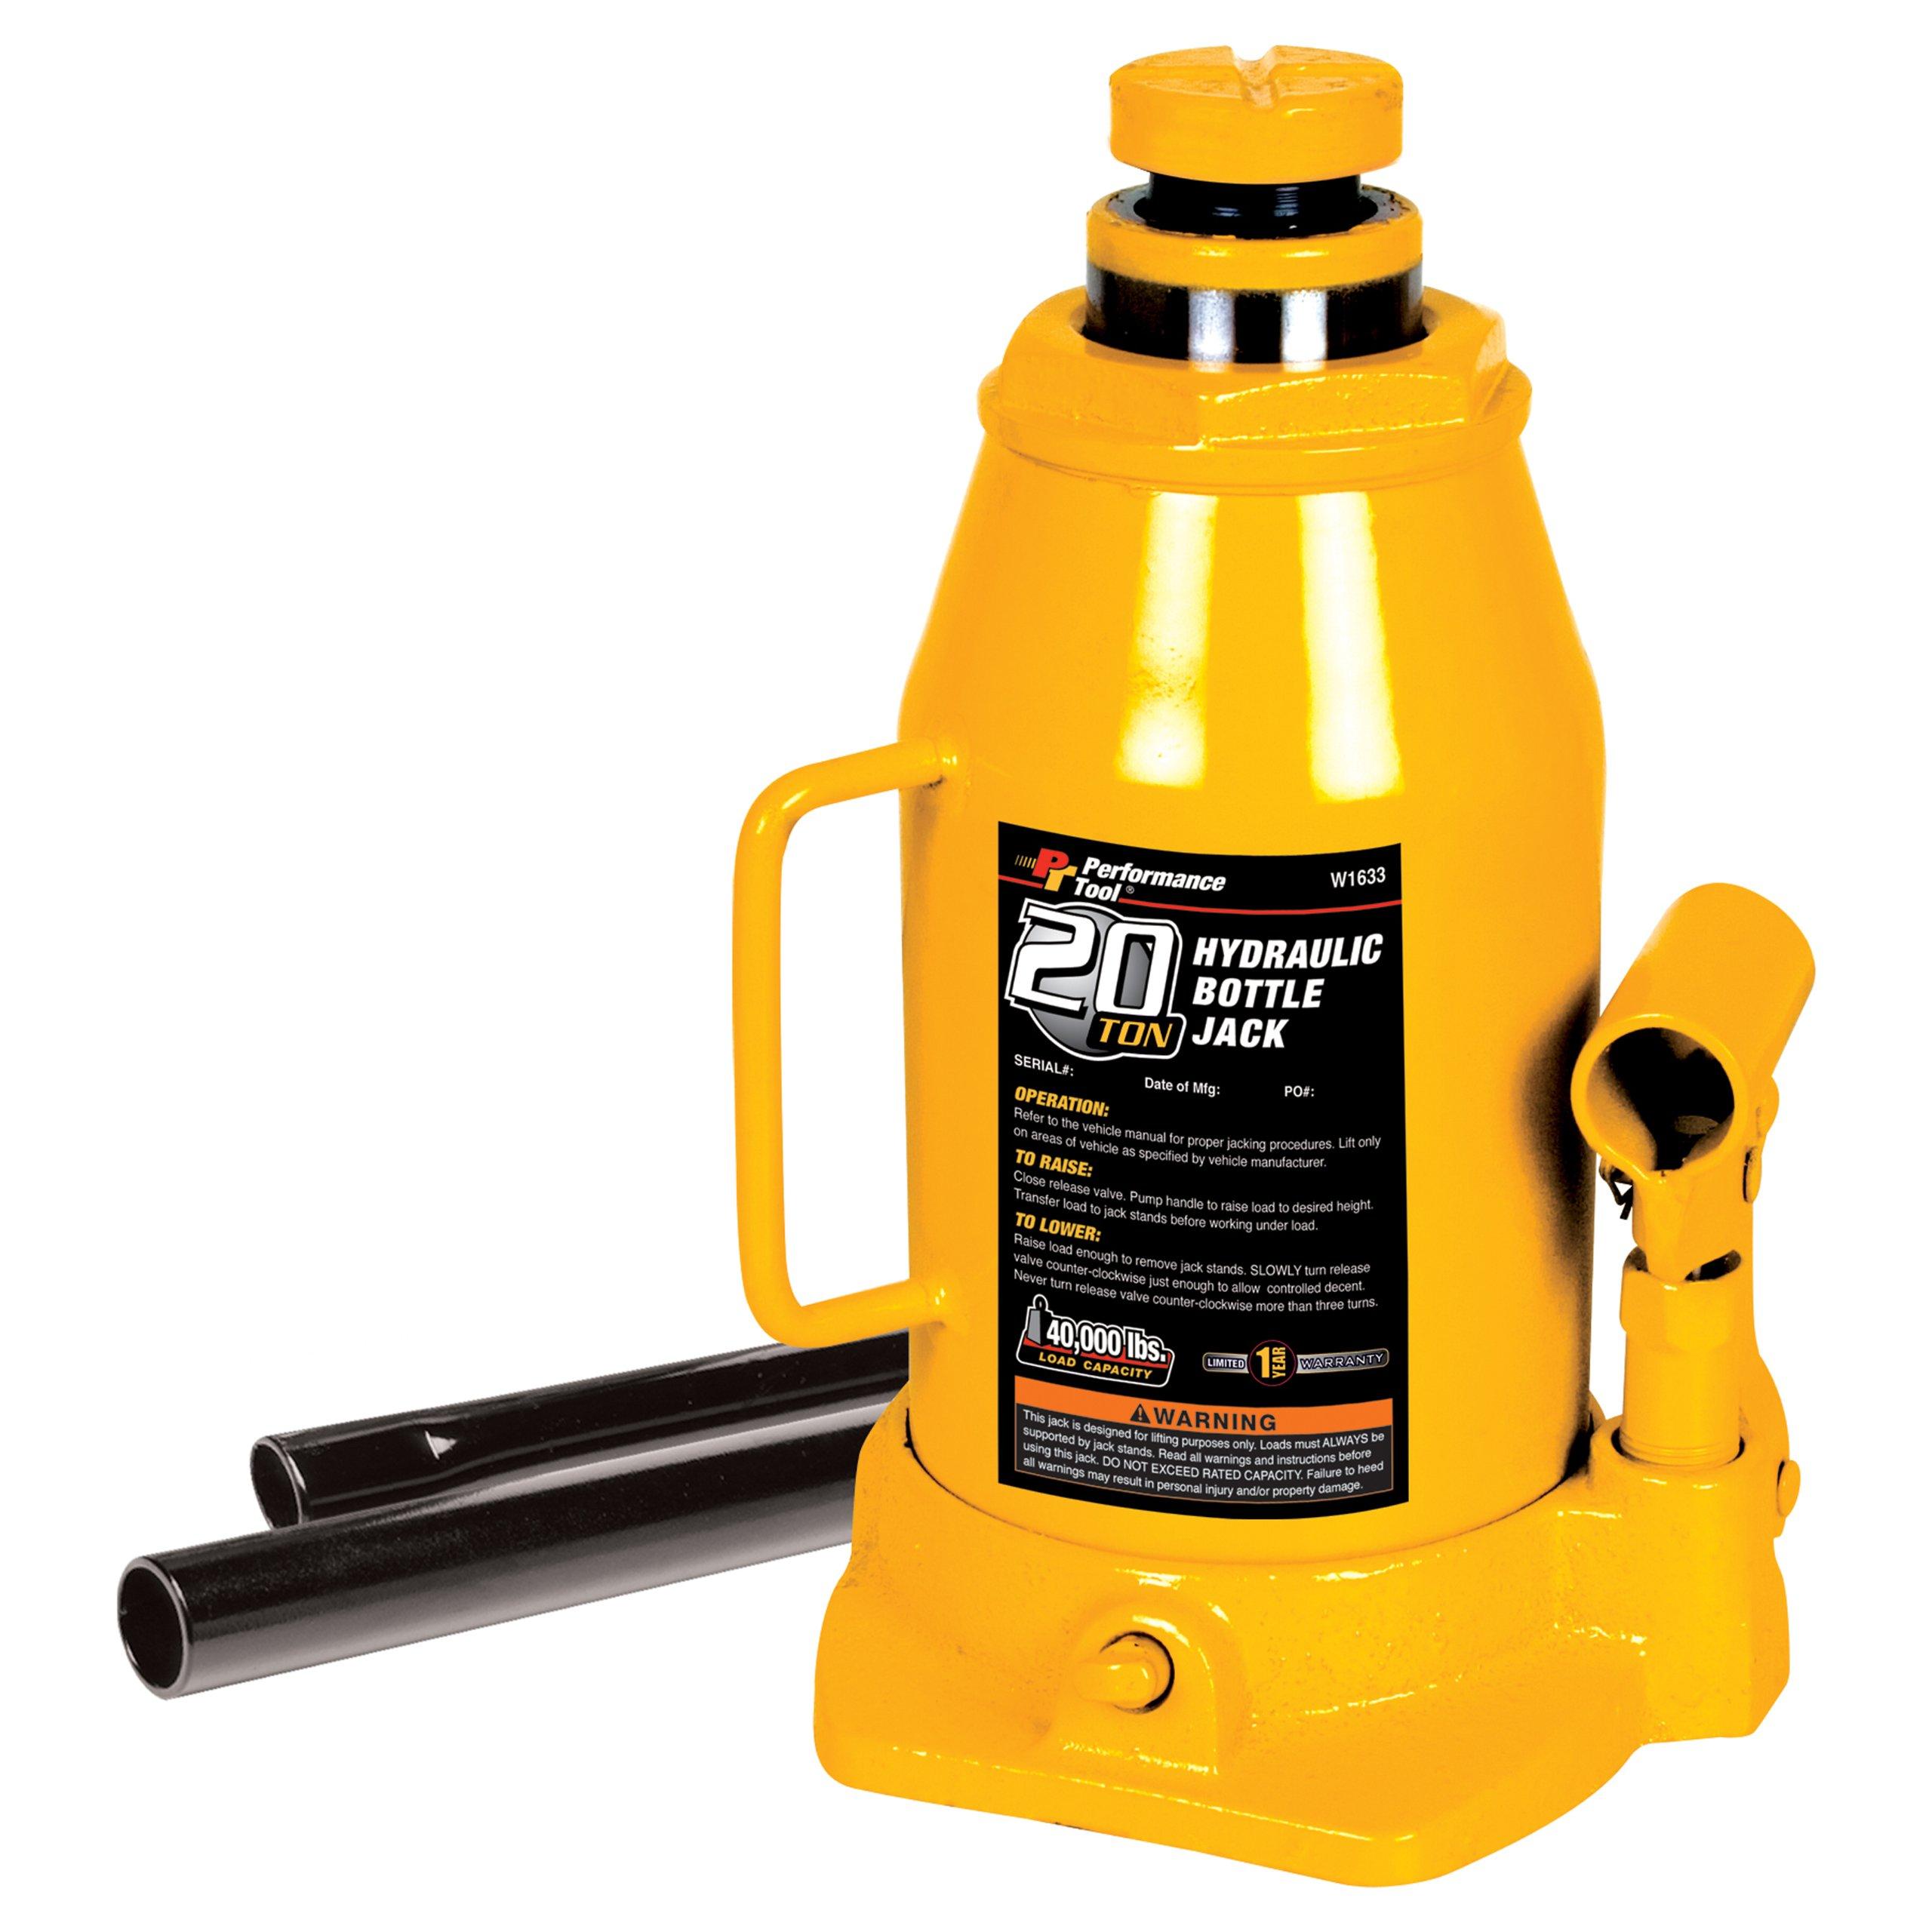 Performance Tool W1633 20 Ton (40,000 lbs.) Heavy Duty Hydraulic Bottle Jack